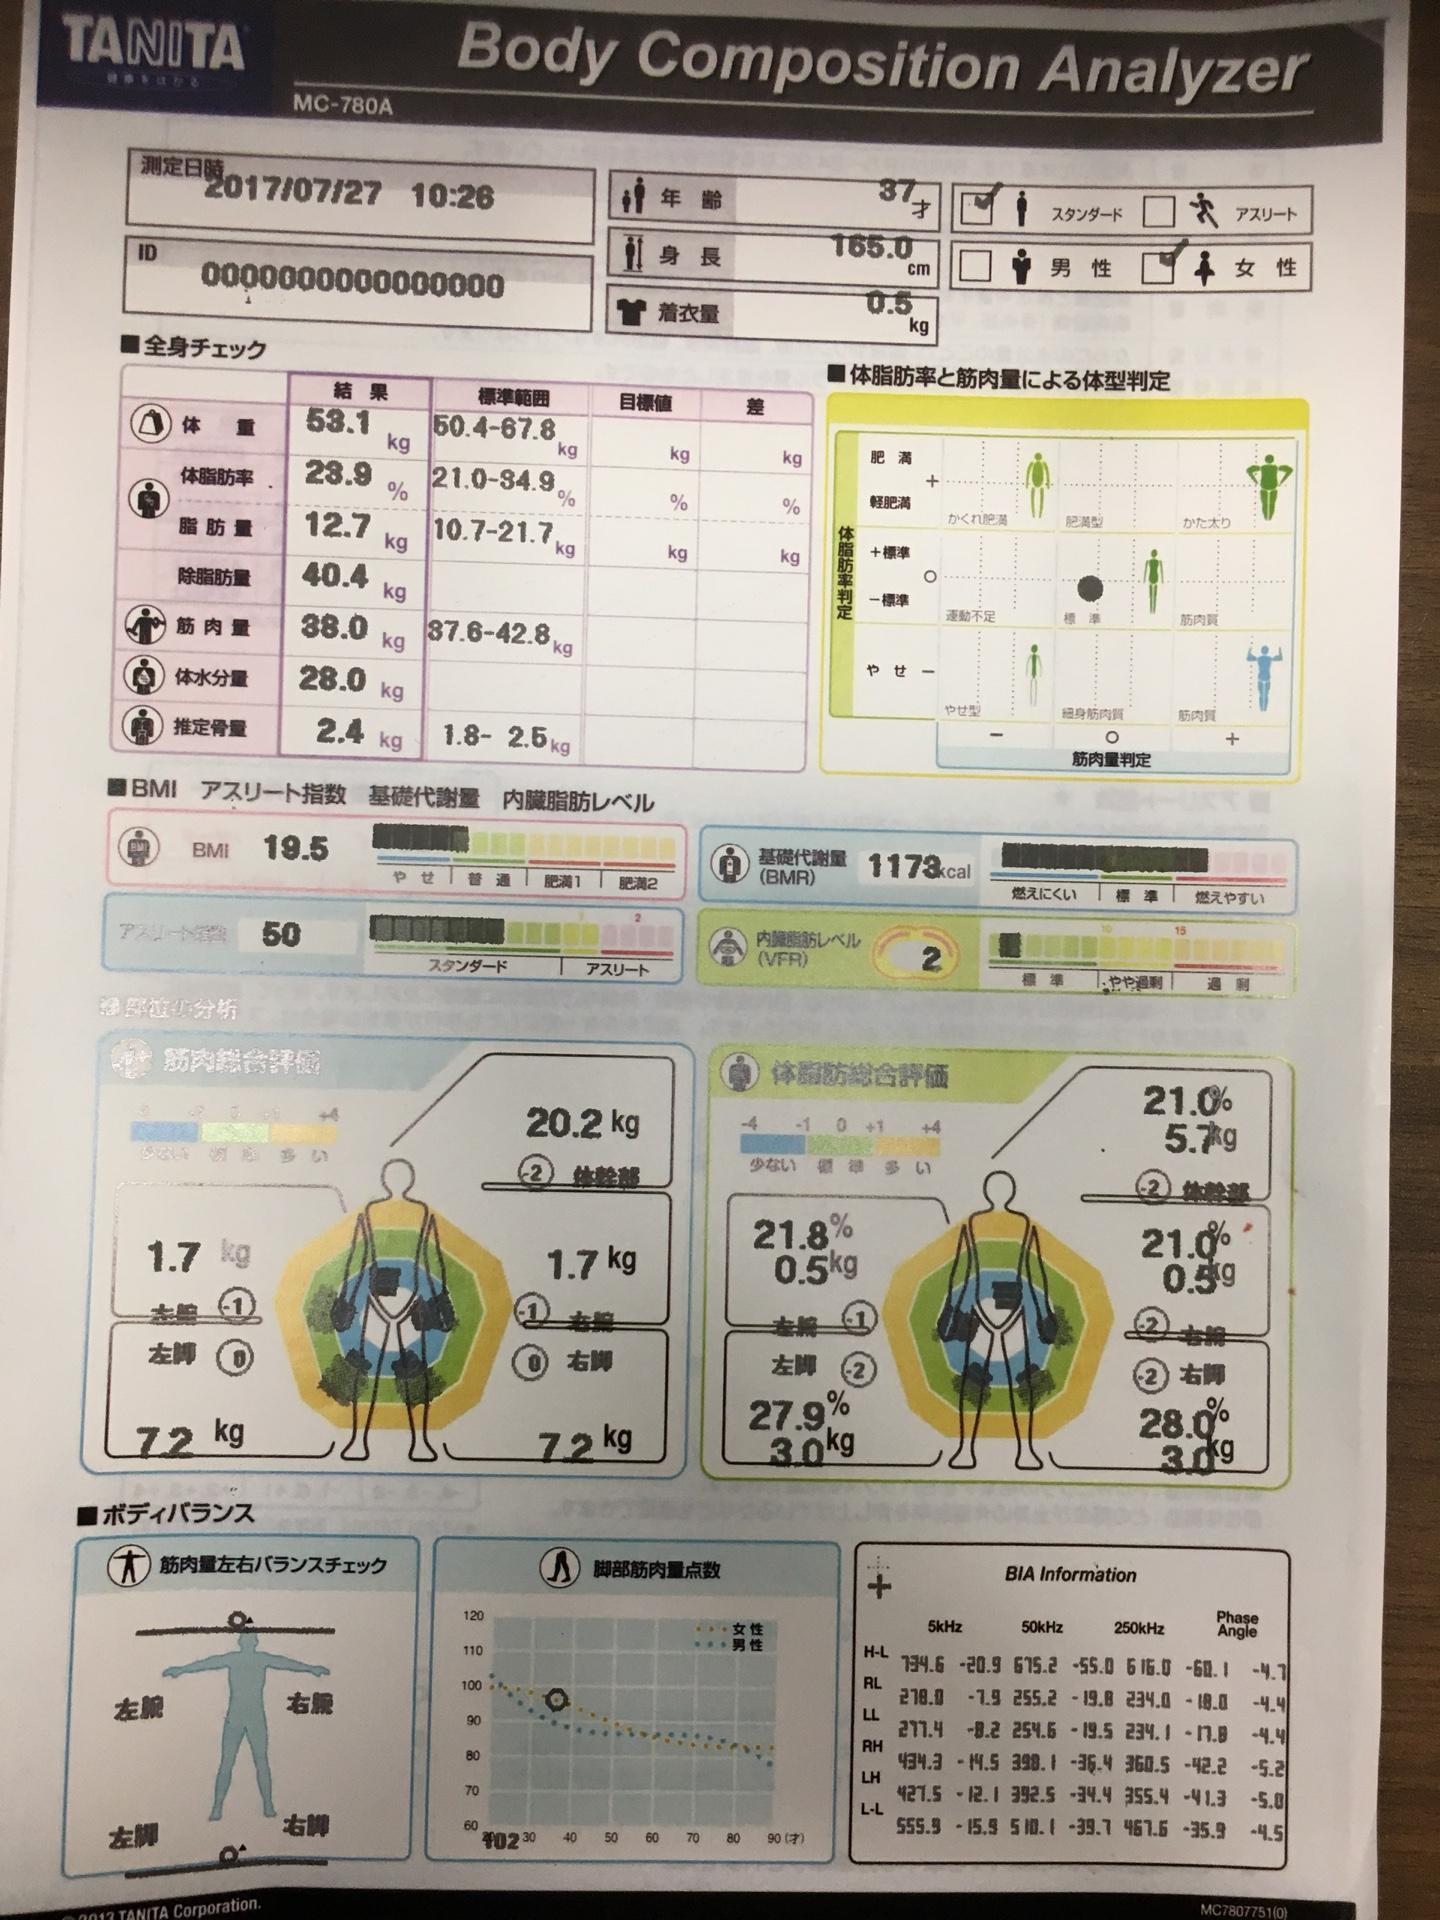 IMG_7250-19-03-18-13-11.JPG